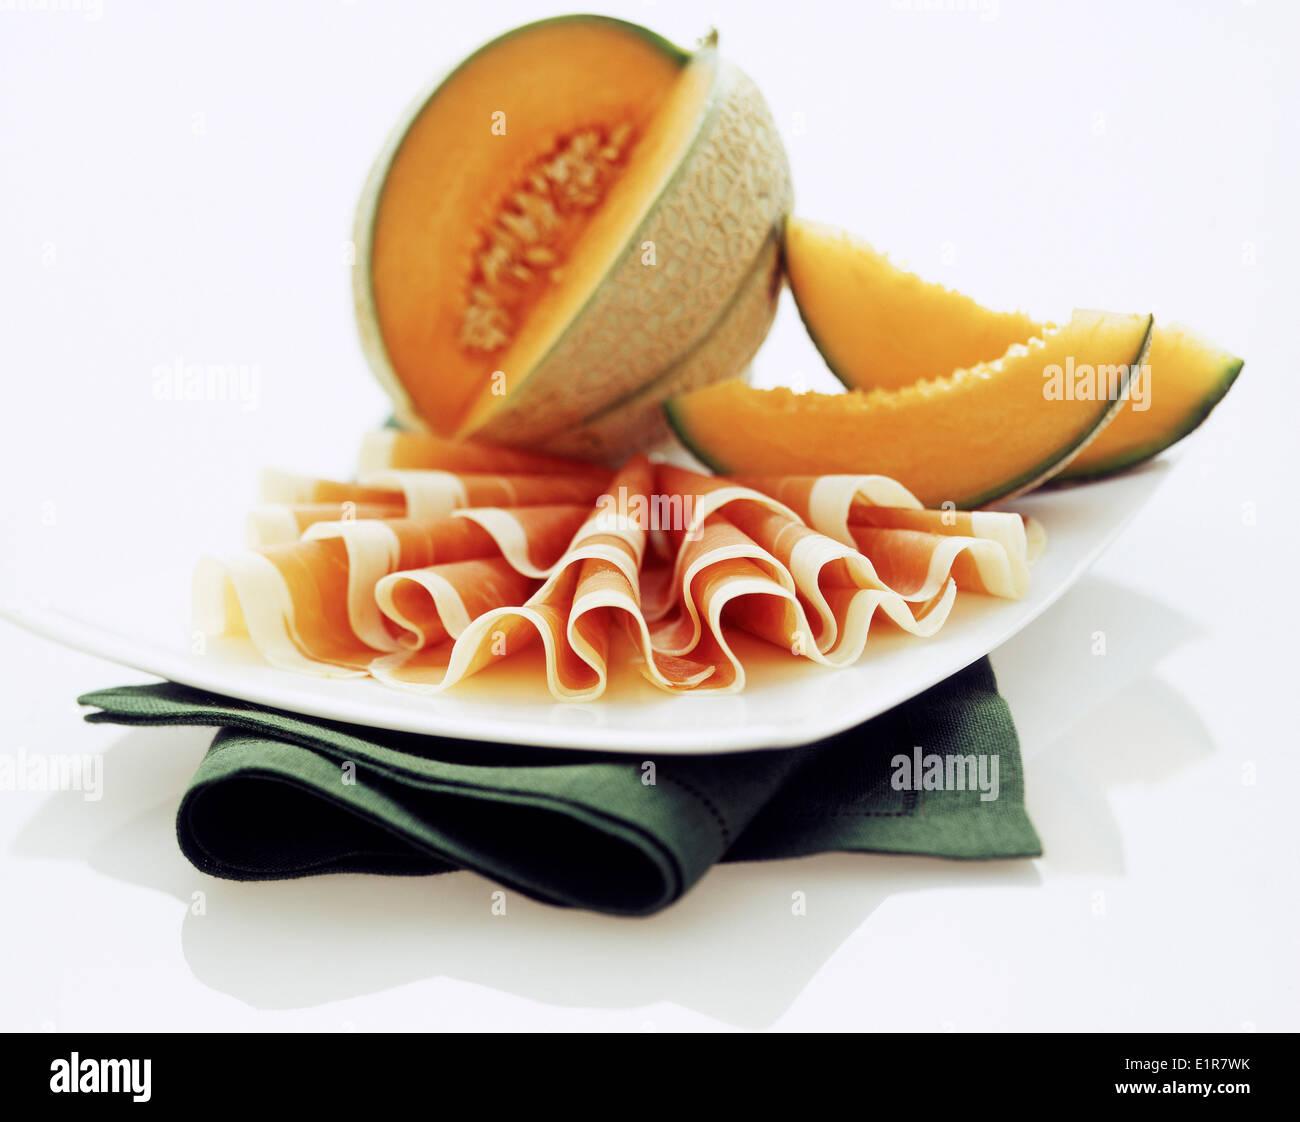 Melon and Parma ham - Stock Image